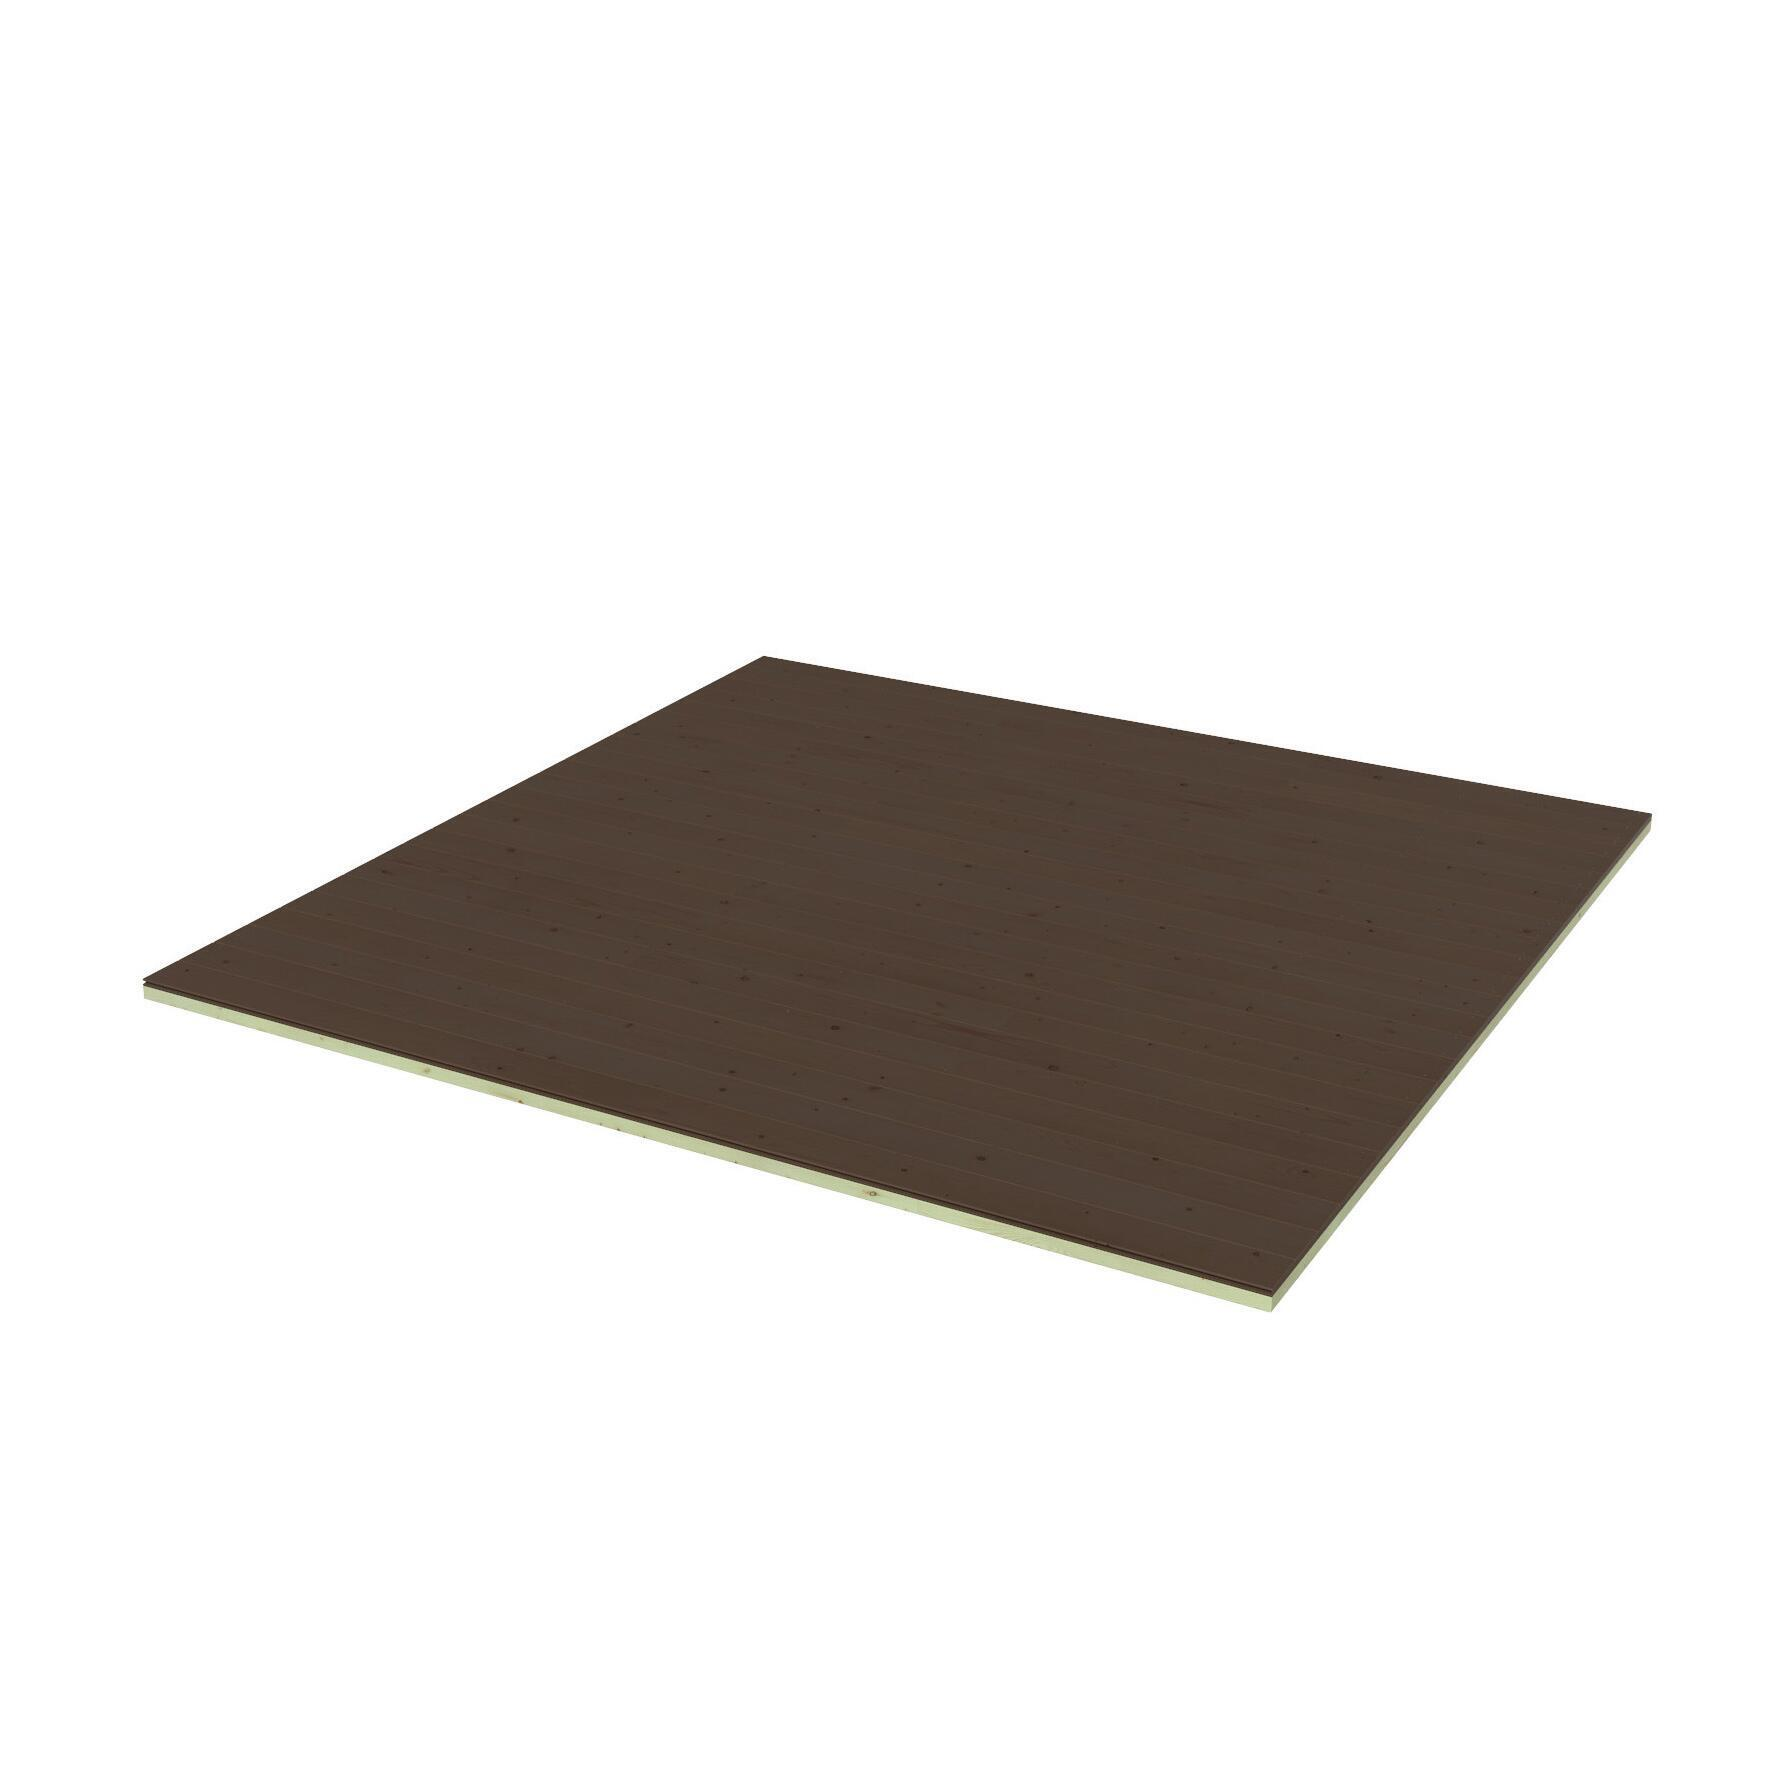 Pavimento per casetta da giardino Viola DECOR ET JARDIN 241.4 x 250 x 45 cm - 2